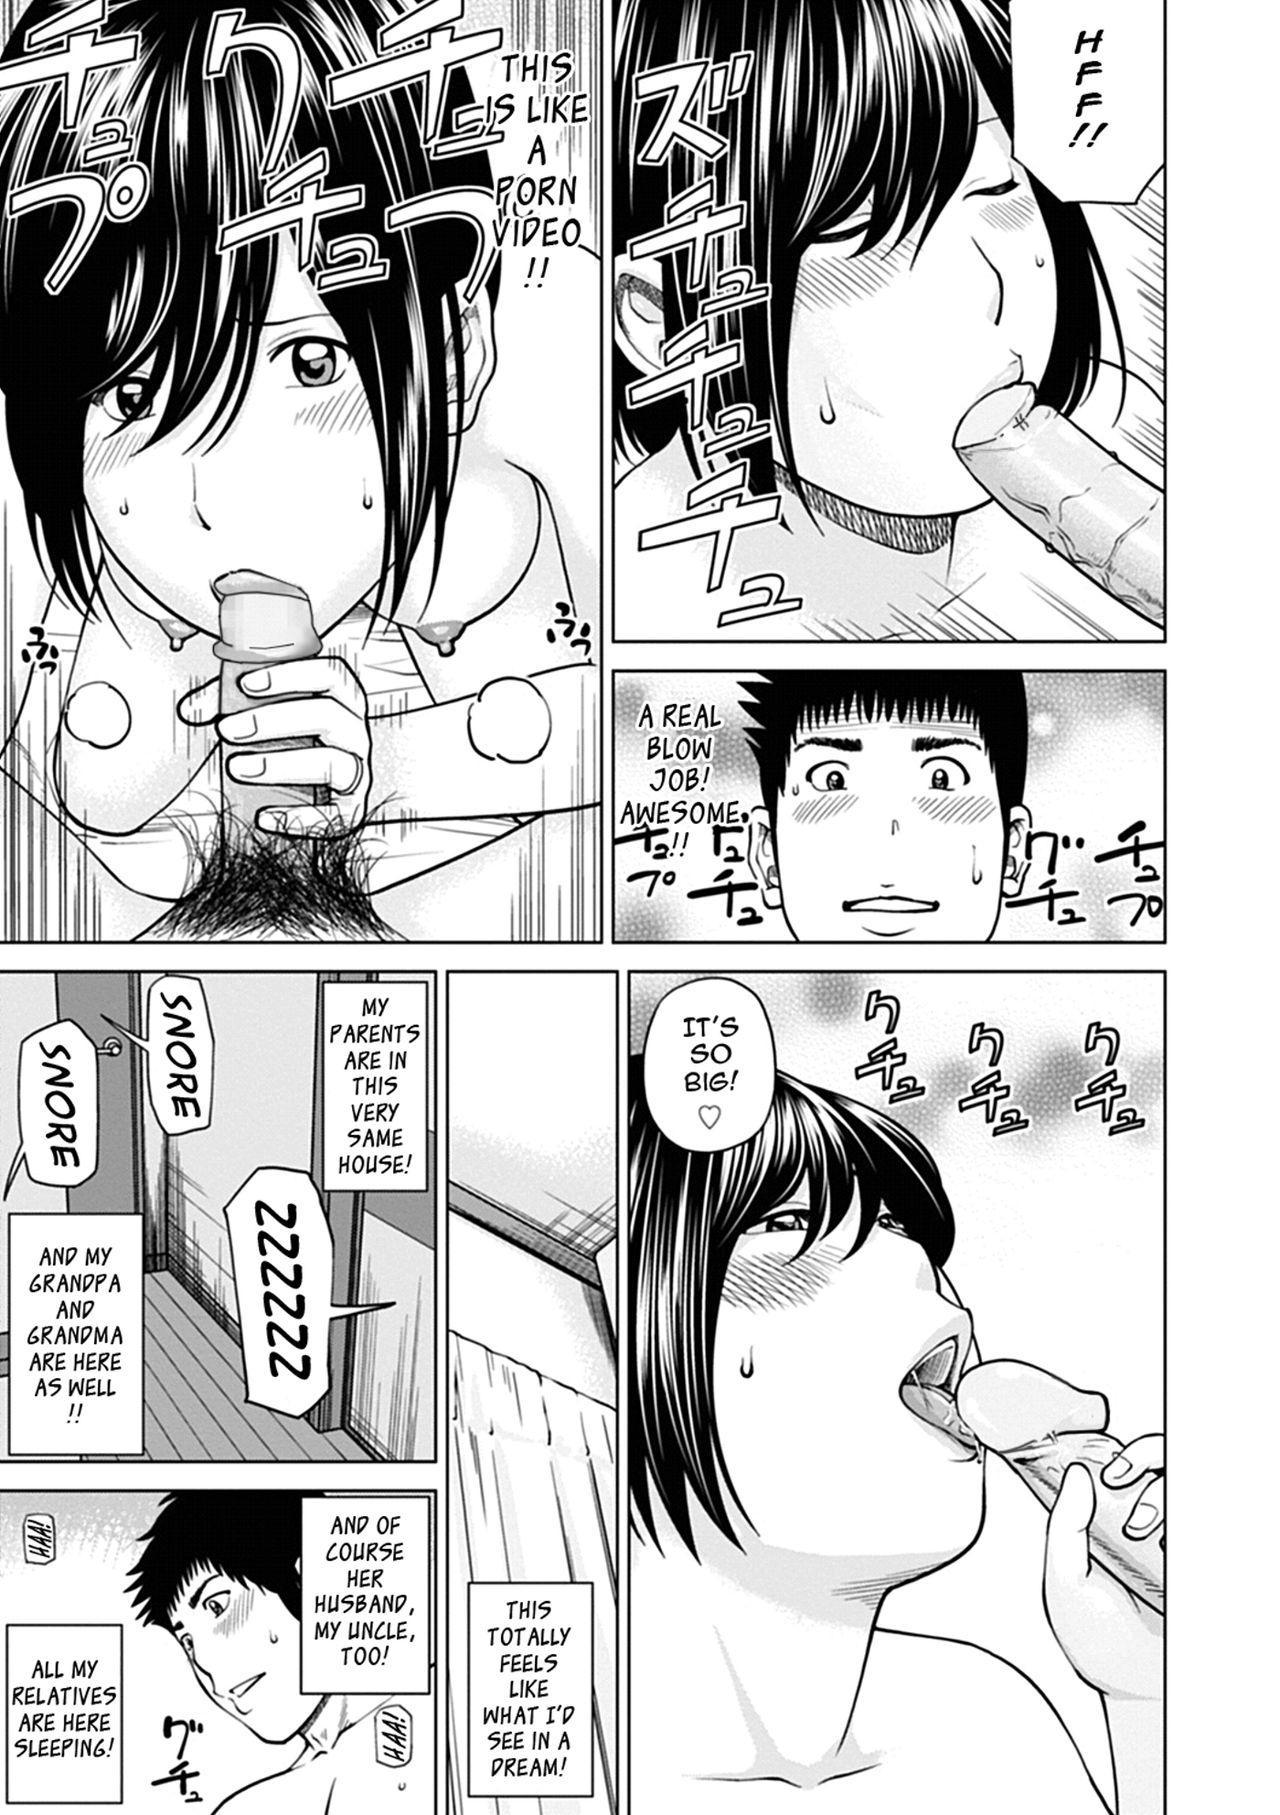 [Kuroki Hidehiko] 36-sai Injuku Sakarizuma | 36-Year-Old Randy Mature Wife [English] {Tadanohito} [Digital] [Uncensored] 17